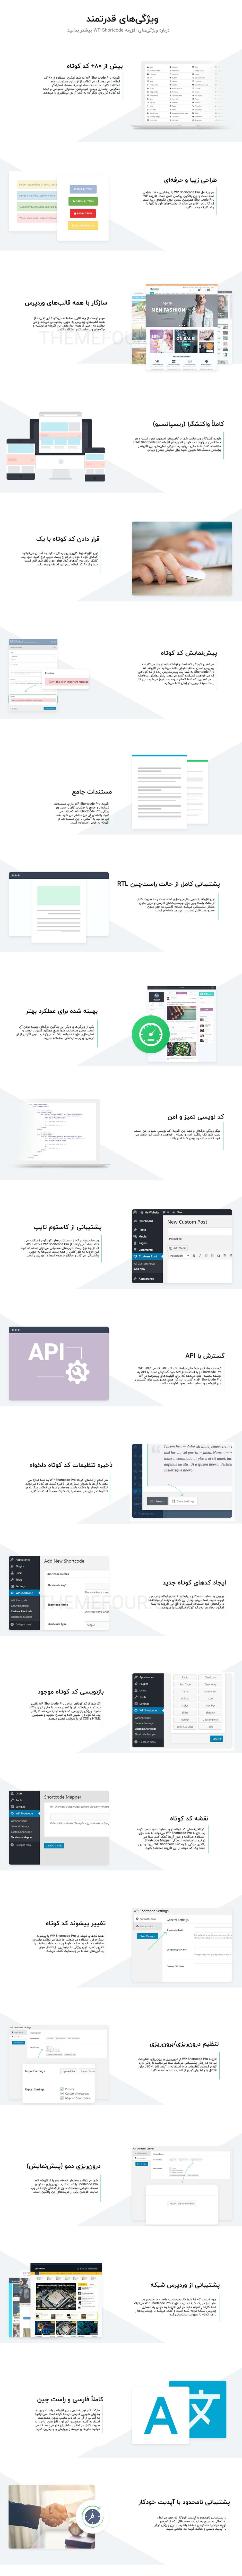 افزونه WP Shortcode Pro